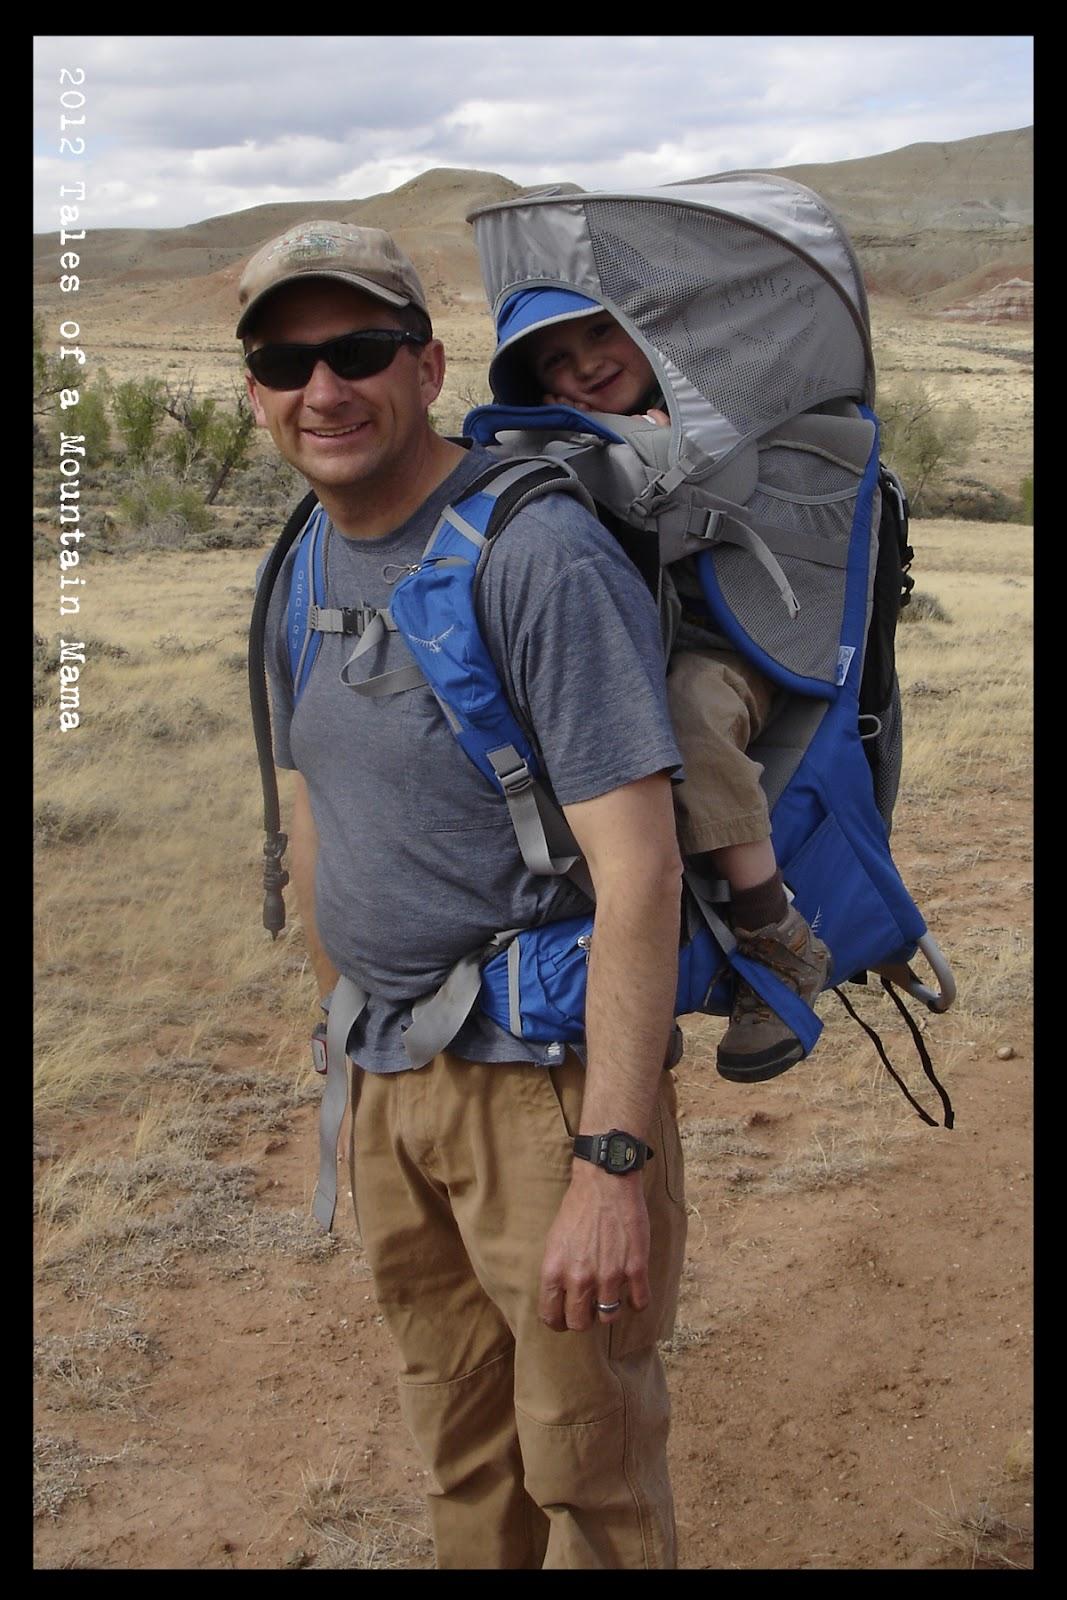 Osprey Poco Plus Kid Carrier *Gear Review*